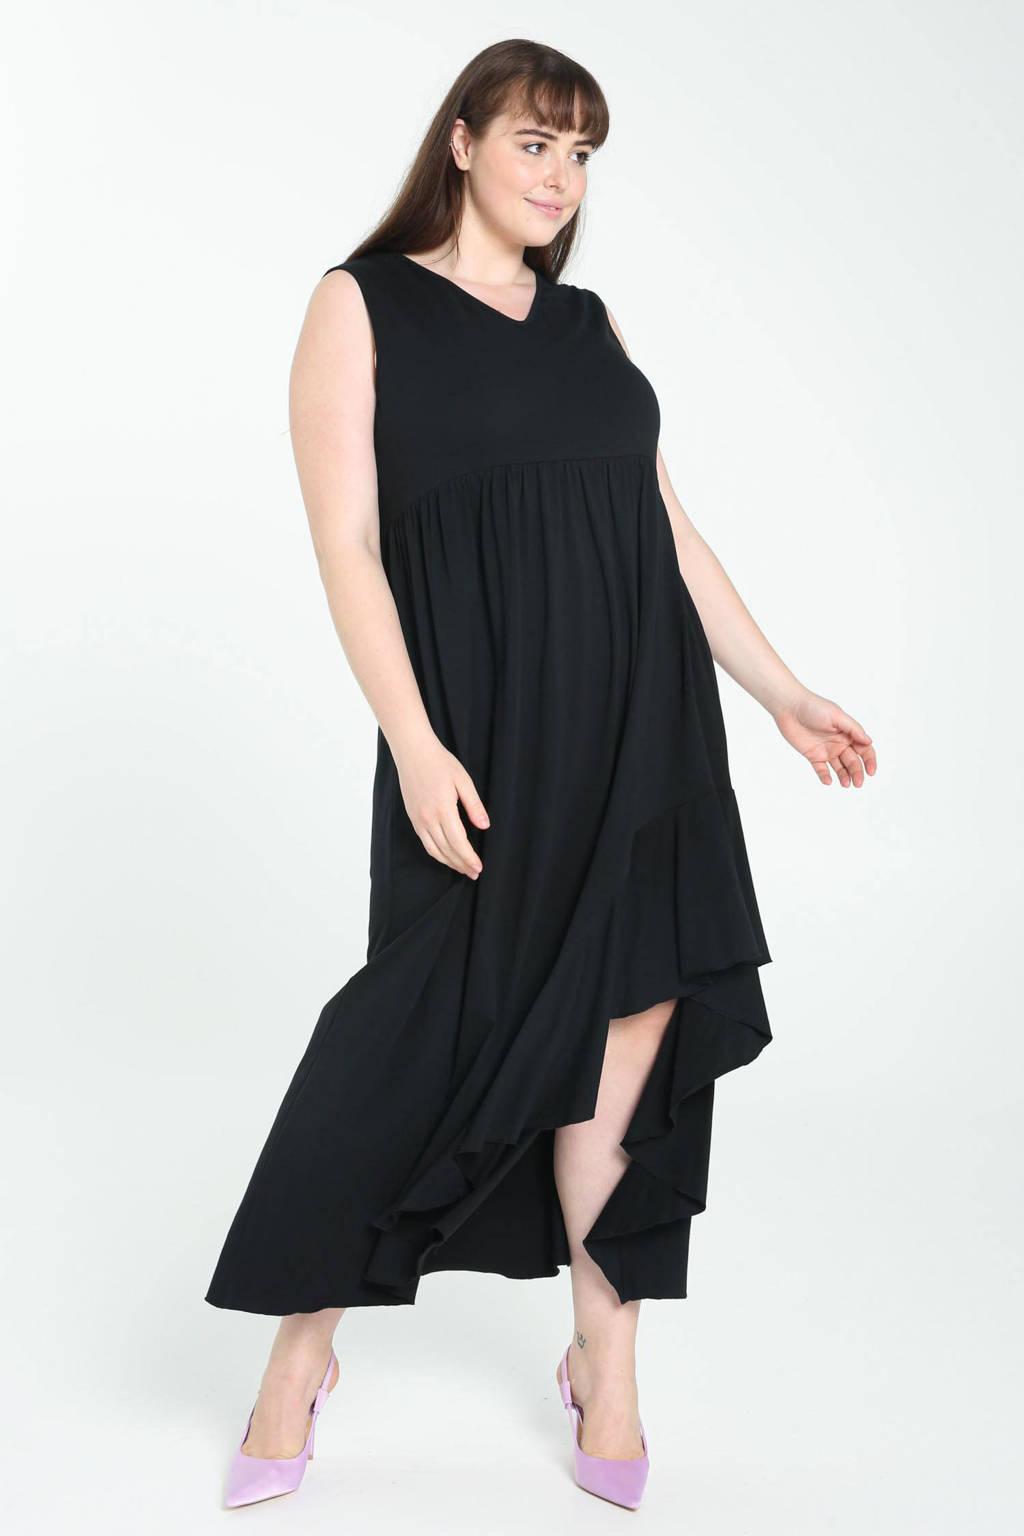 PROMISS jurk met volant zwart, Zwart